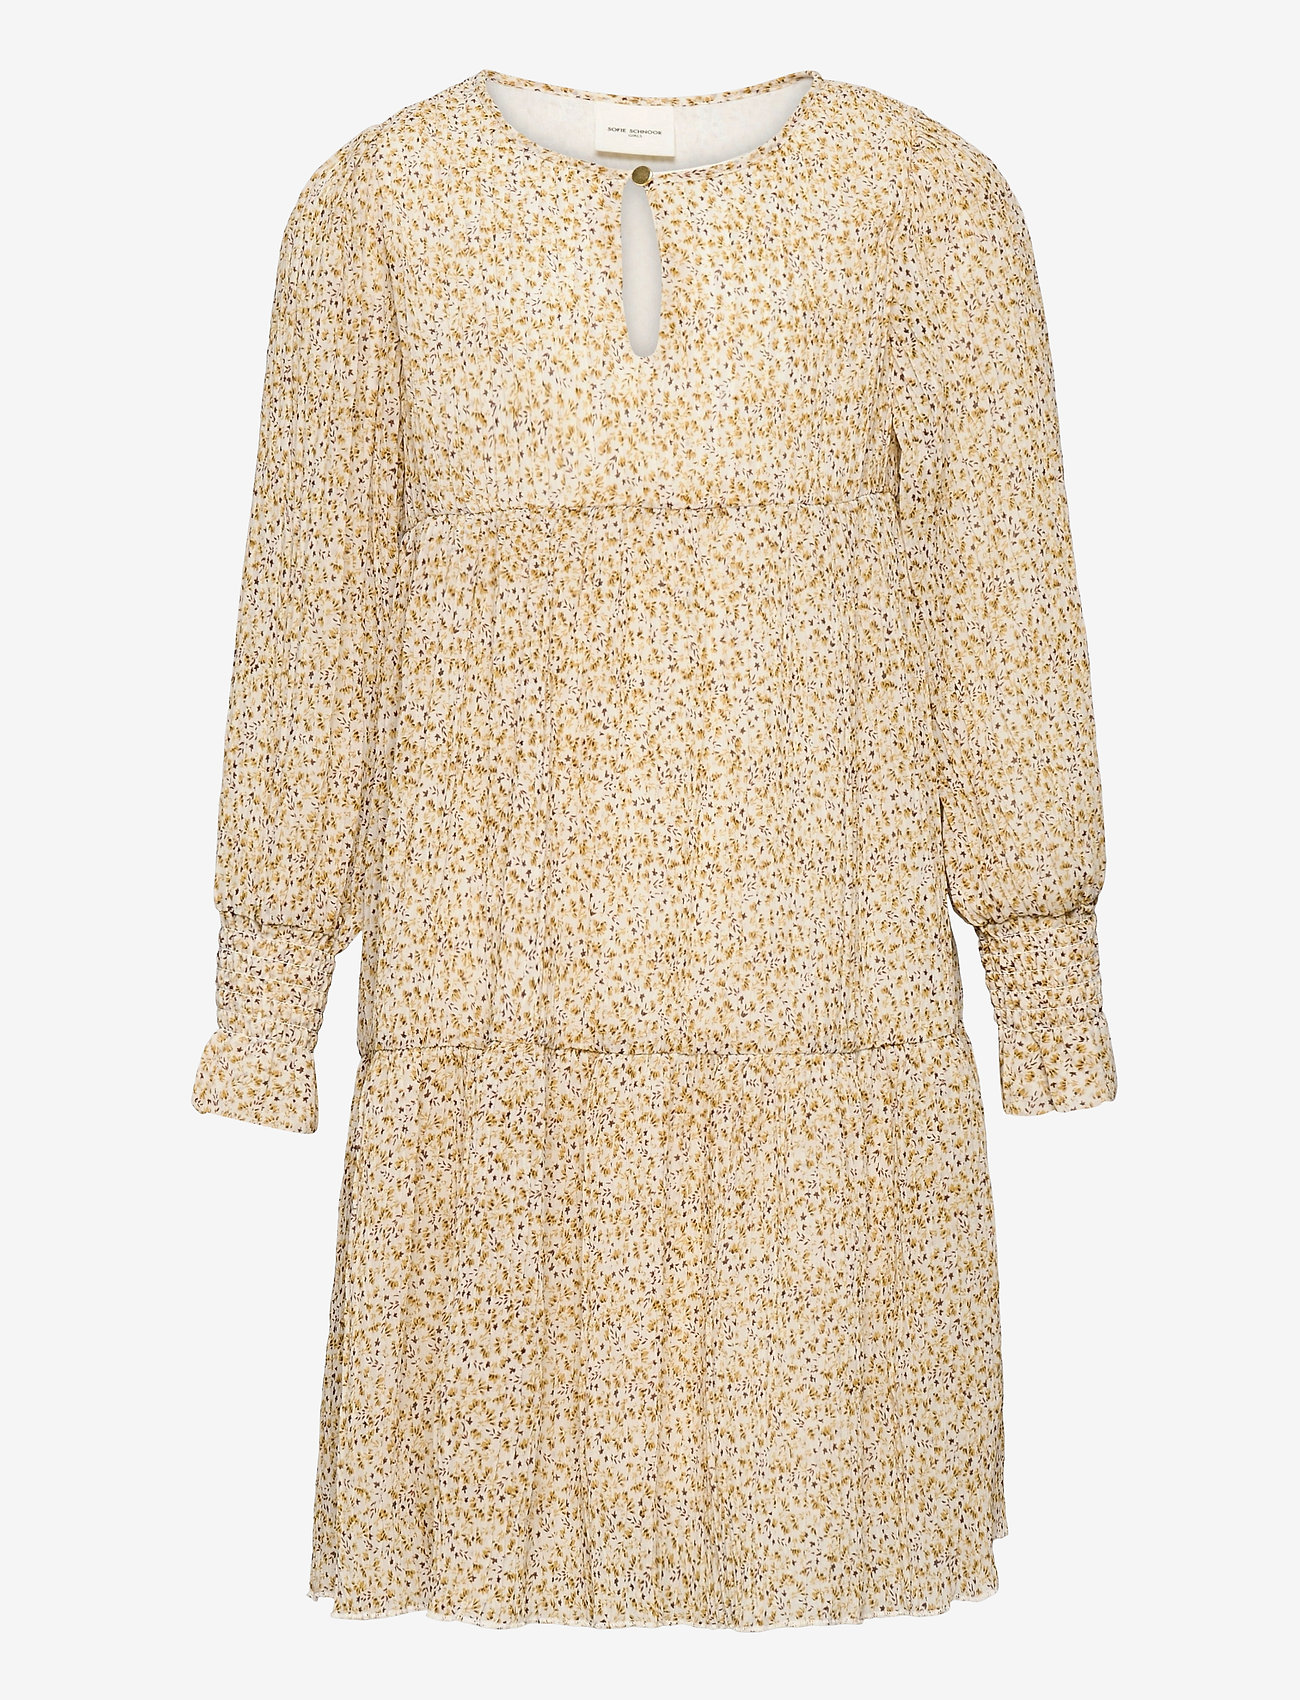 Petit by Sofie Schnoor - Dress - kleider - yellow - 0